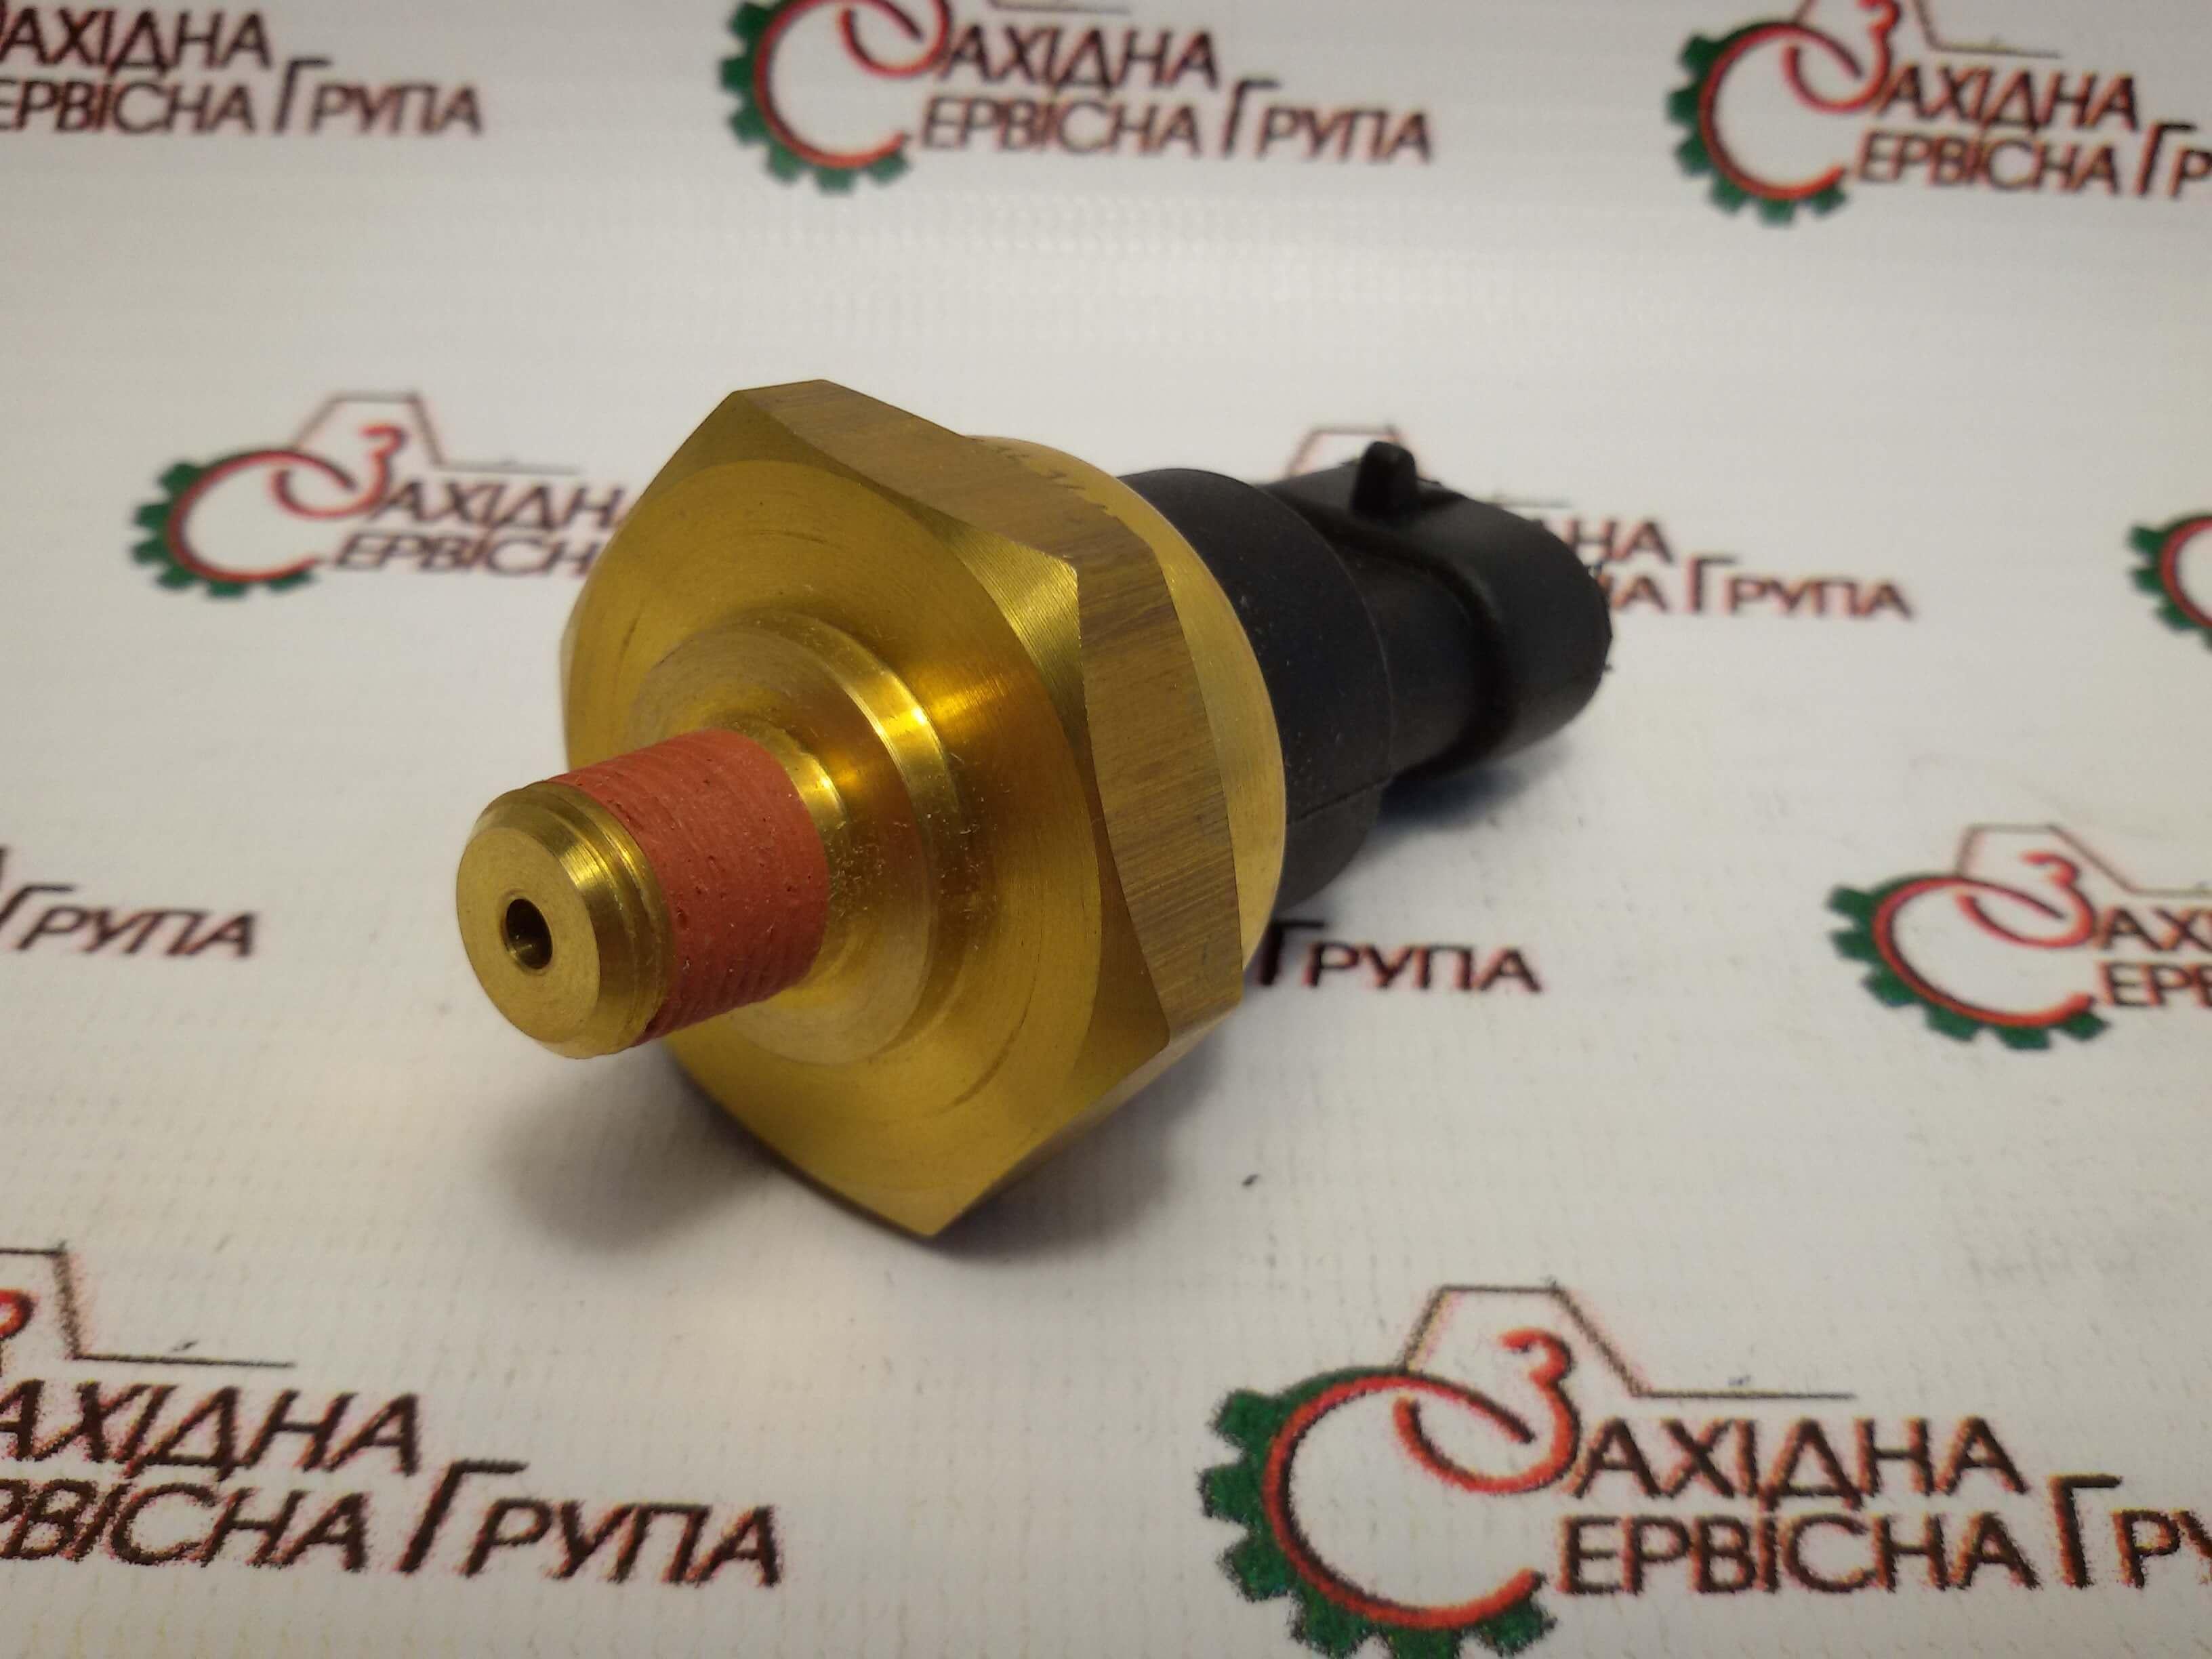 Датчик тиску масла двигуна Cummins KTA19, 2897691, 3408607, 3056344.